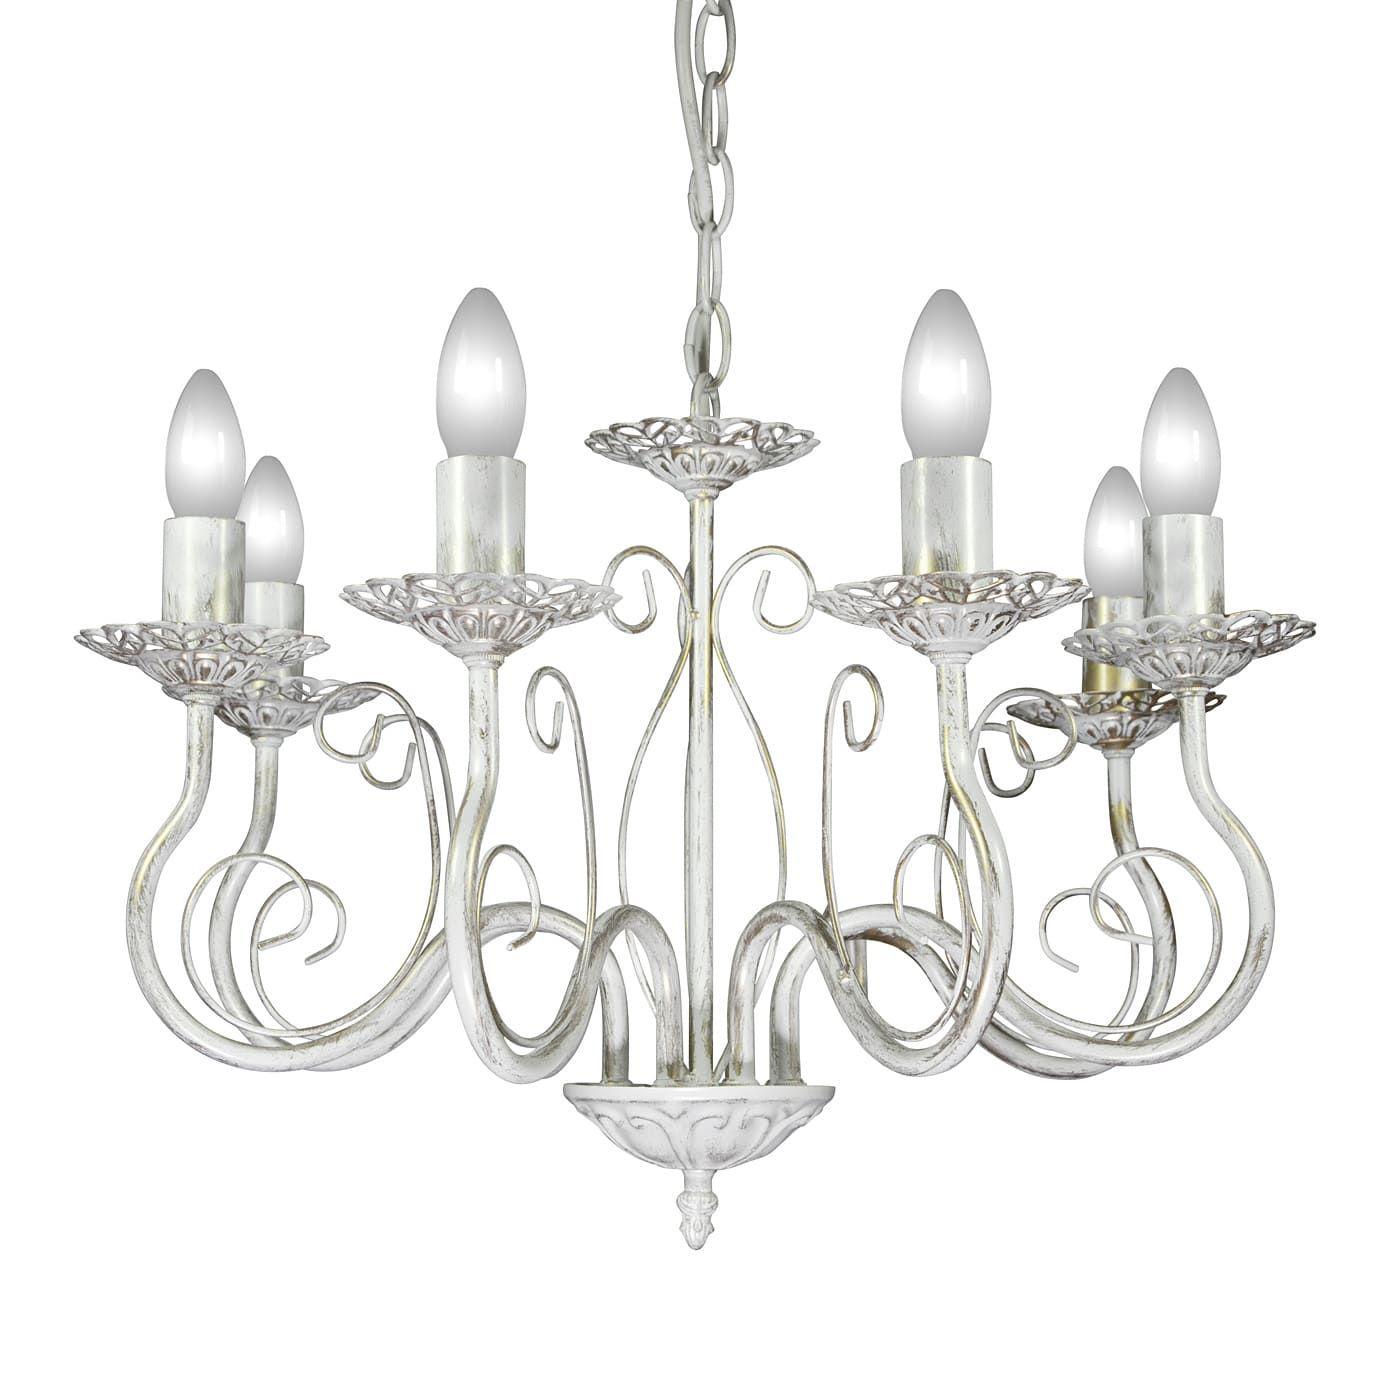 PETRASVET / Pendant chandelier S1161-6, 6xE14 max. 60W